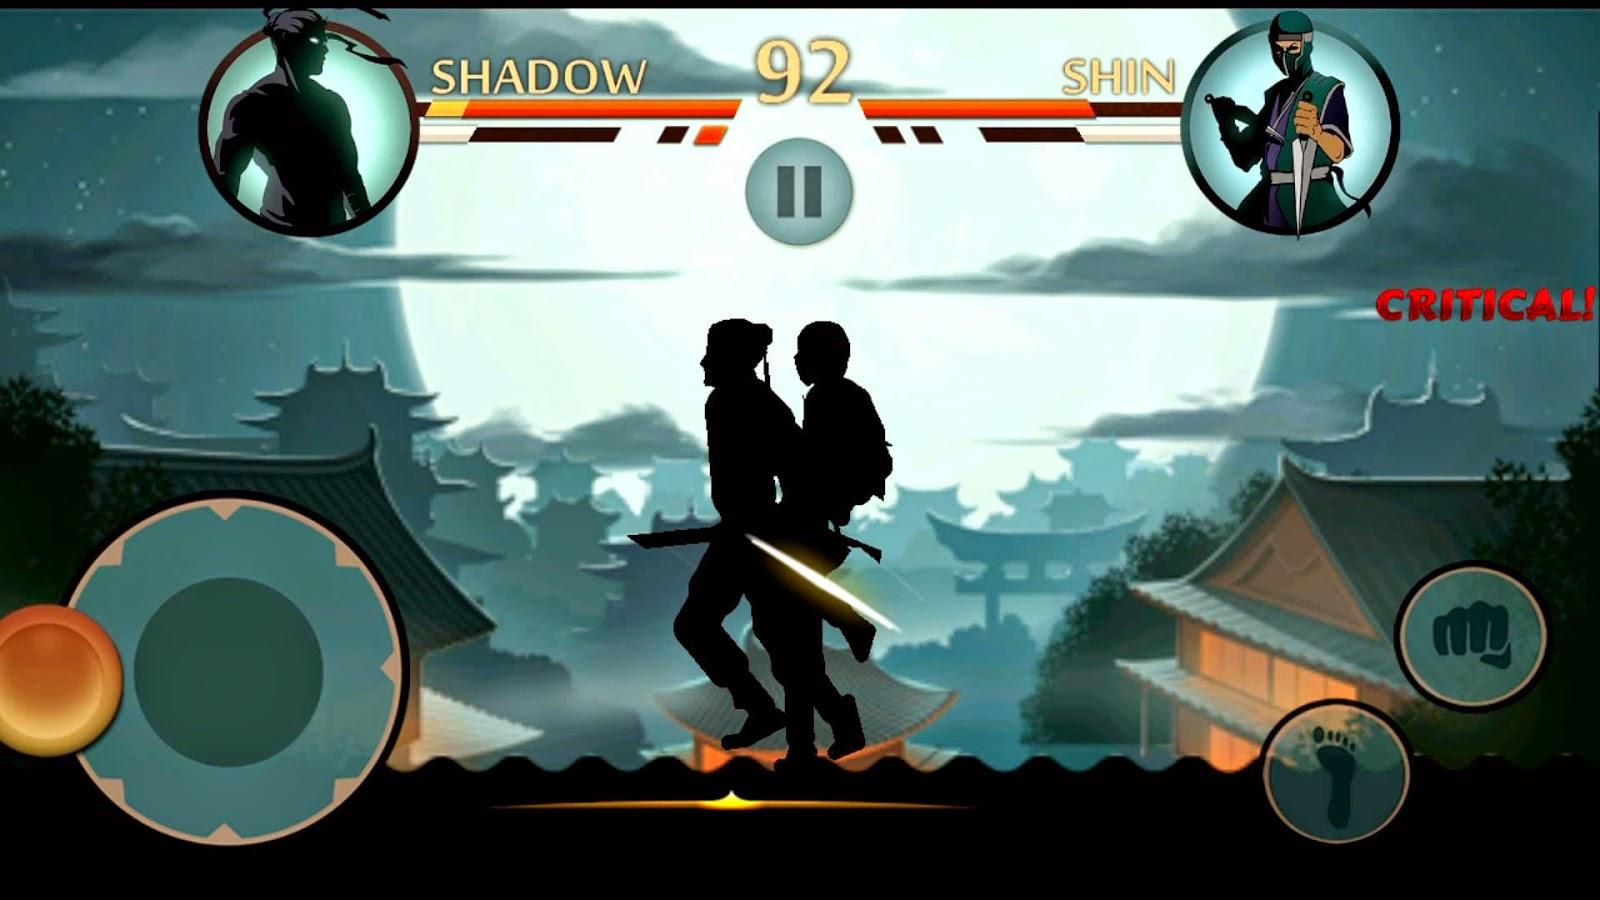 Ninja Vs Samurai Fight Shadow Fight Wallpaper...